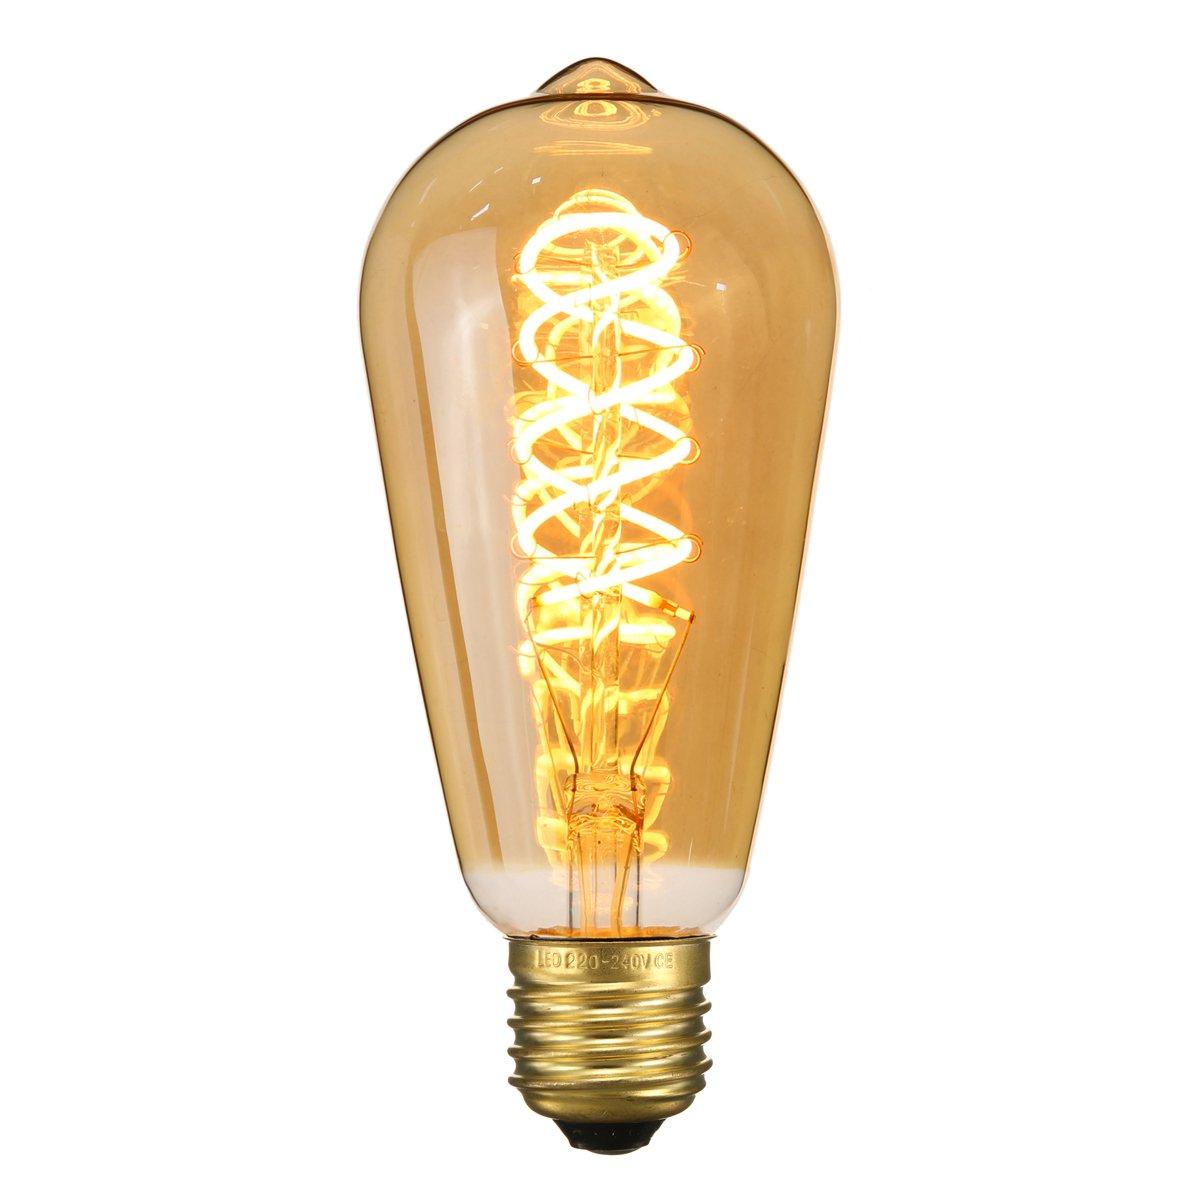 Elfeland Vintage LED Bulbs, E27 3W Spiral Double Twist Flexible LED Filament Decorative Edison Bulbs, Dimmable Warm White 2200K 180LM 85-220V Model ST64(φ 64mm) Dimmable Warm White 2200K 180LM 85-220V Model ST64(φ 64mm)